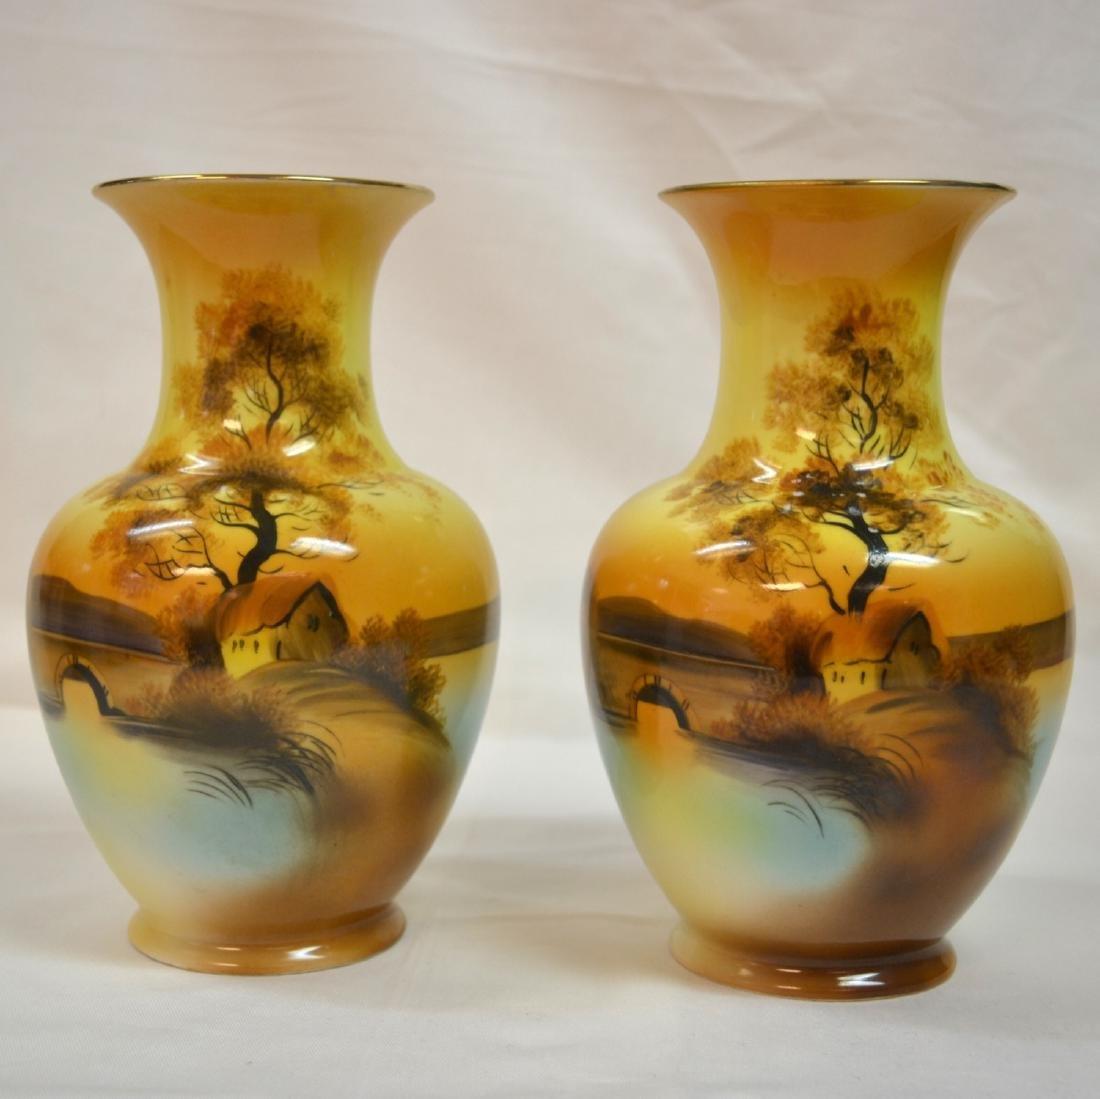 Vitange Morimura Nippon Noritake Hand Painted Porcelain